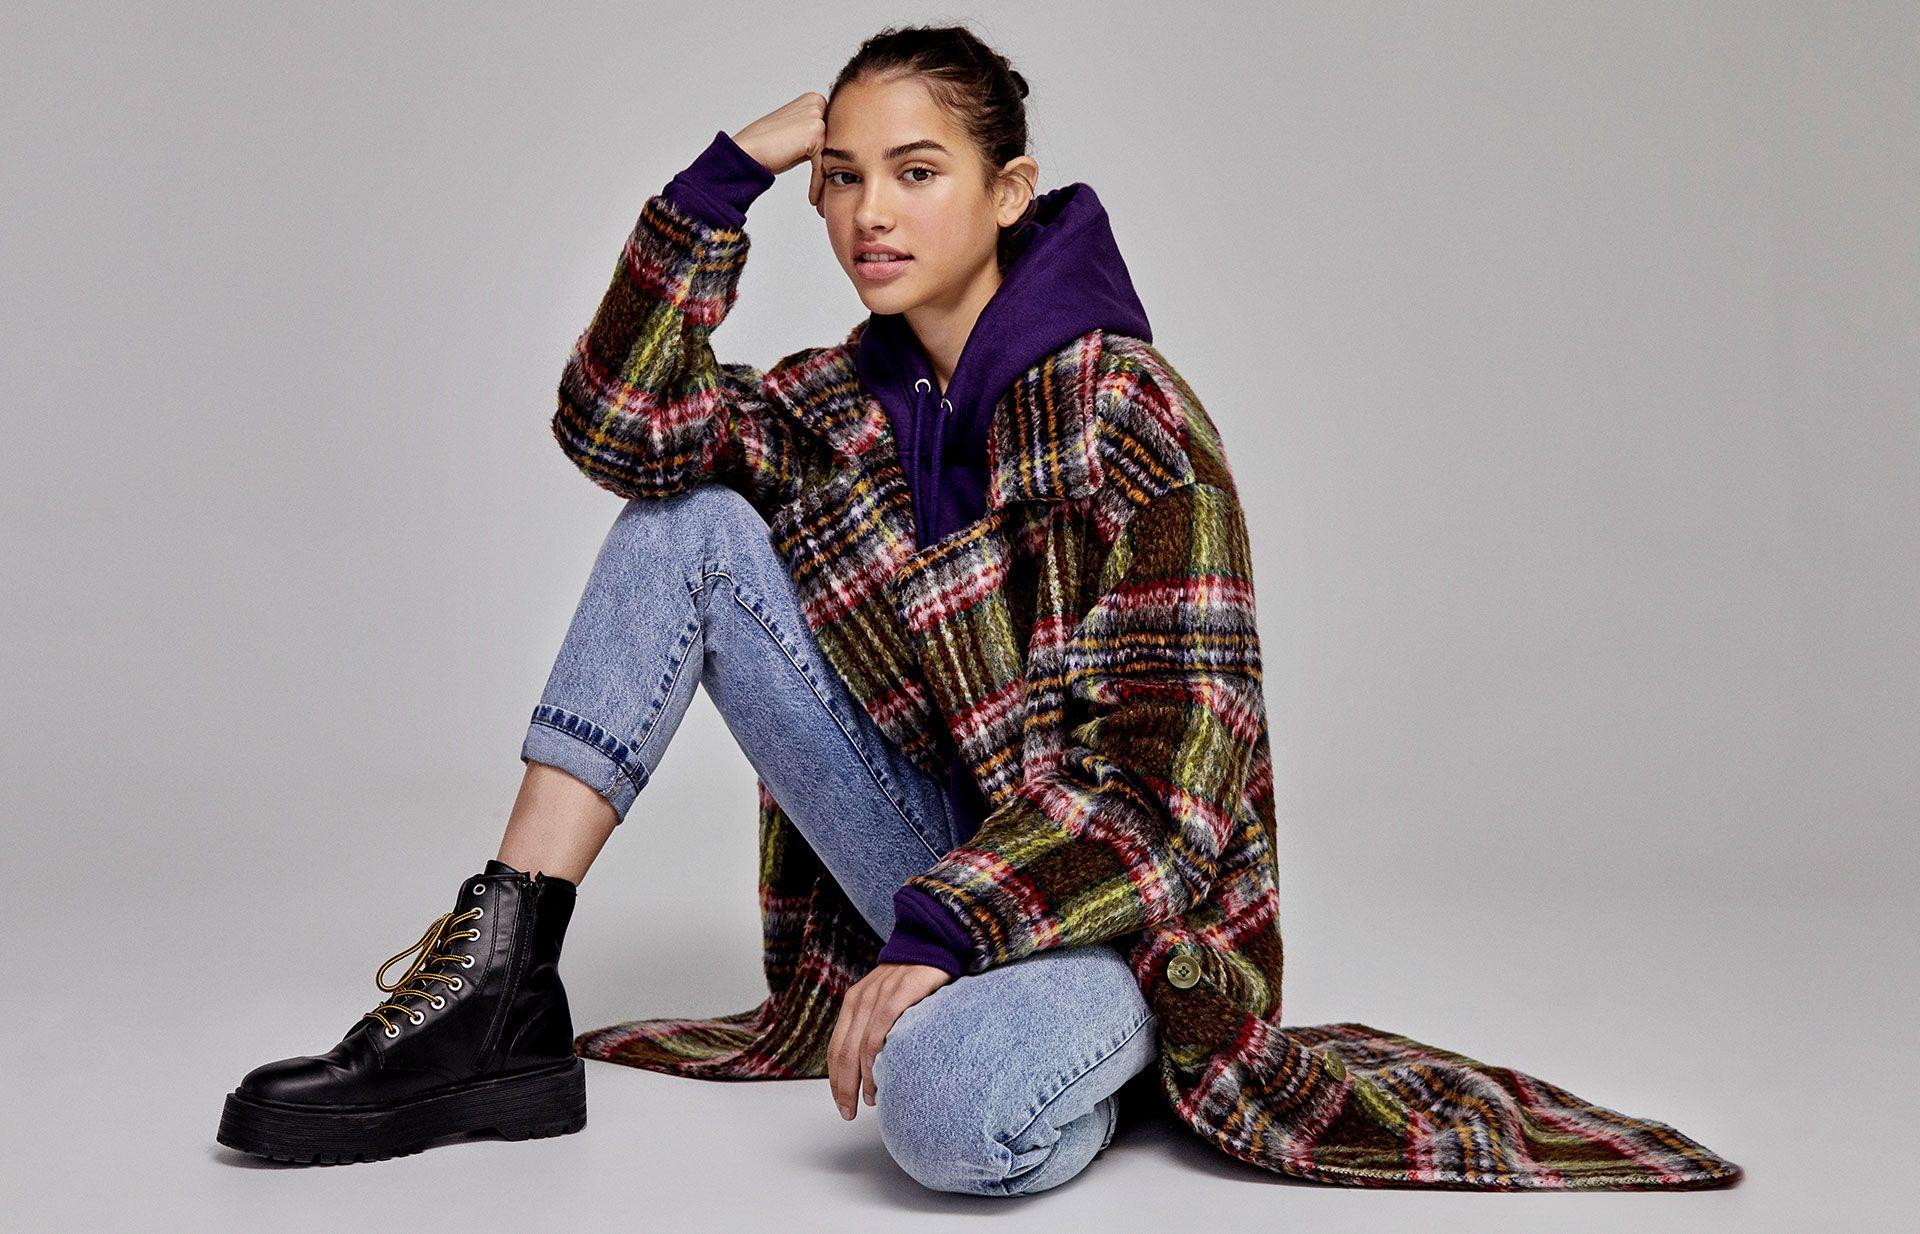 Women's Fashion Collection Autumn Winter 2018 | PULL&BEAR